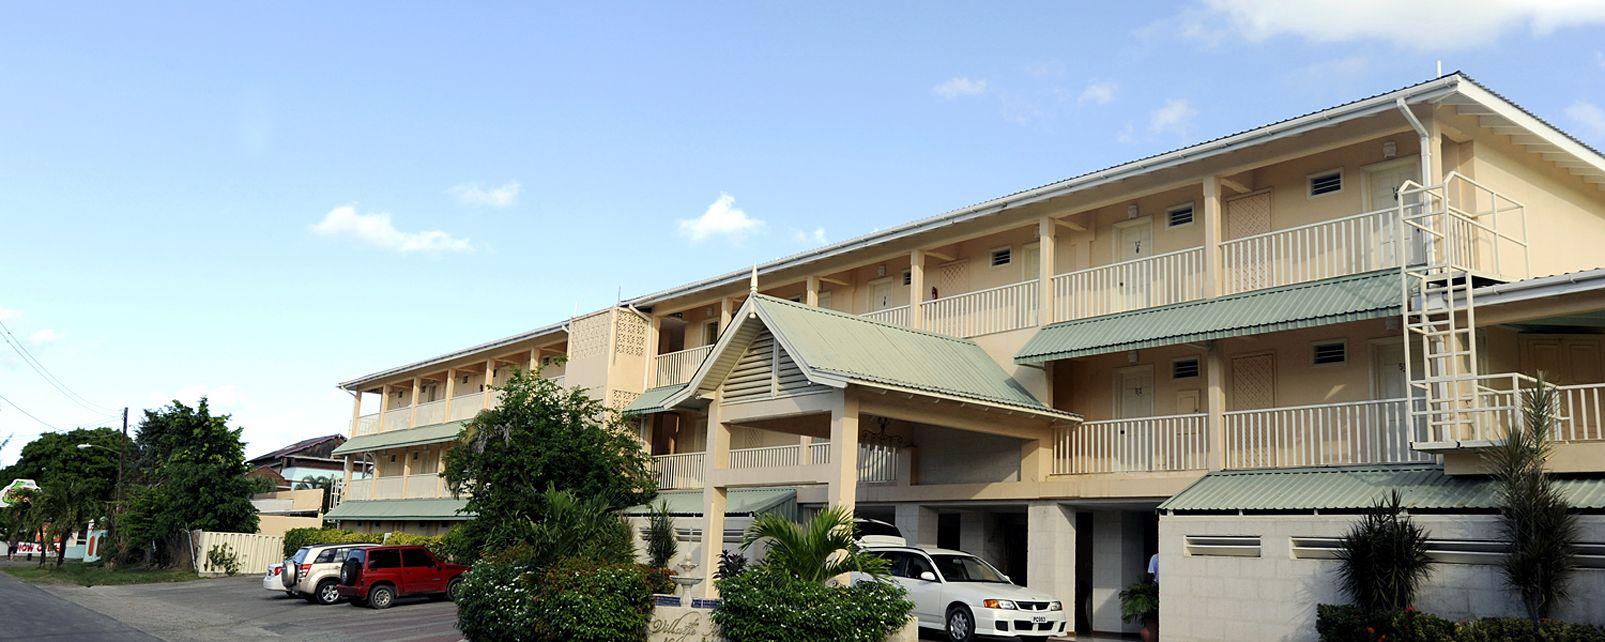 Hotel Harlequin Blu Saint Lucia